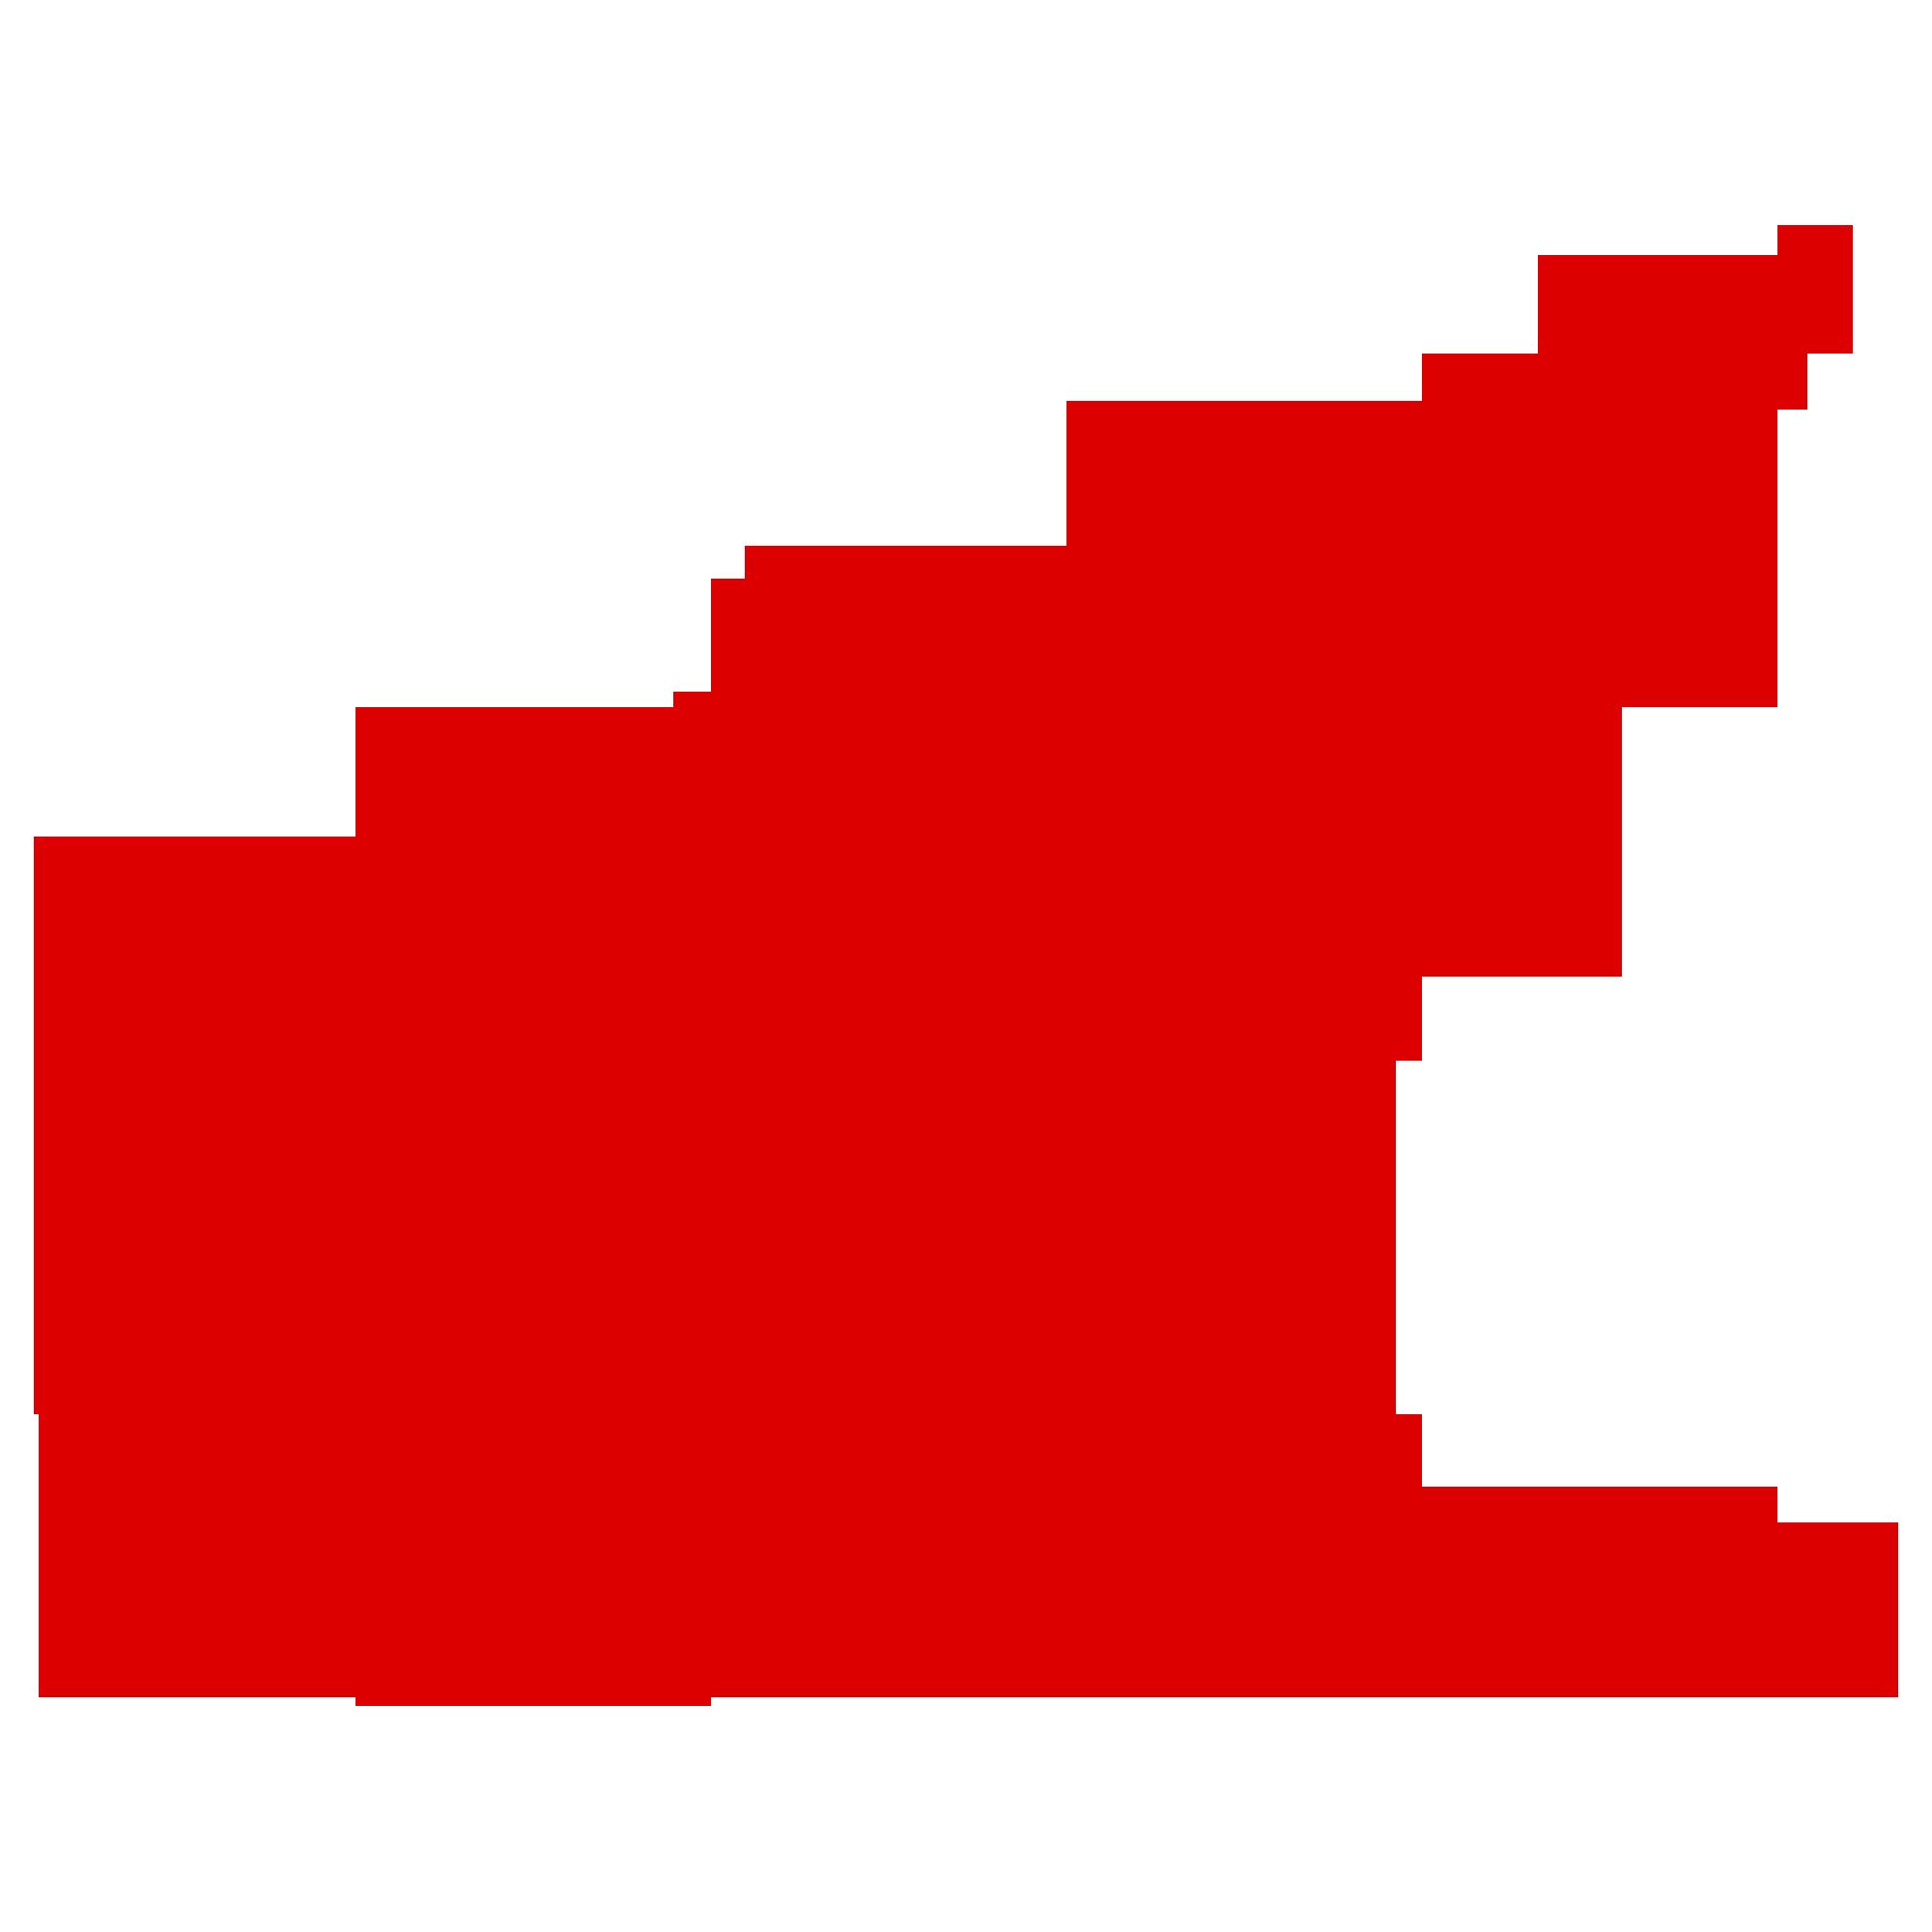 Motorcycle clipart gold wing. Honda motorbikes logo pesquisa